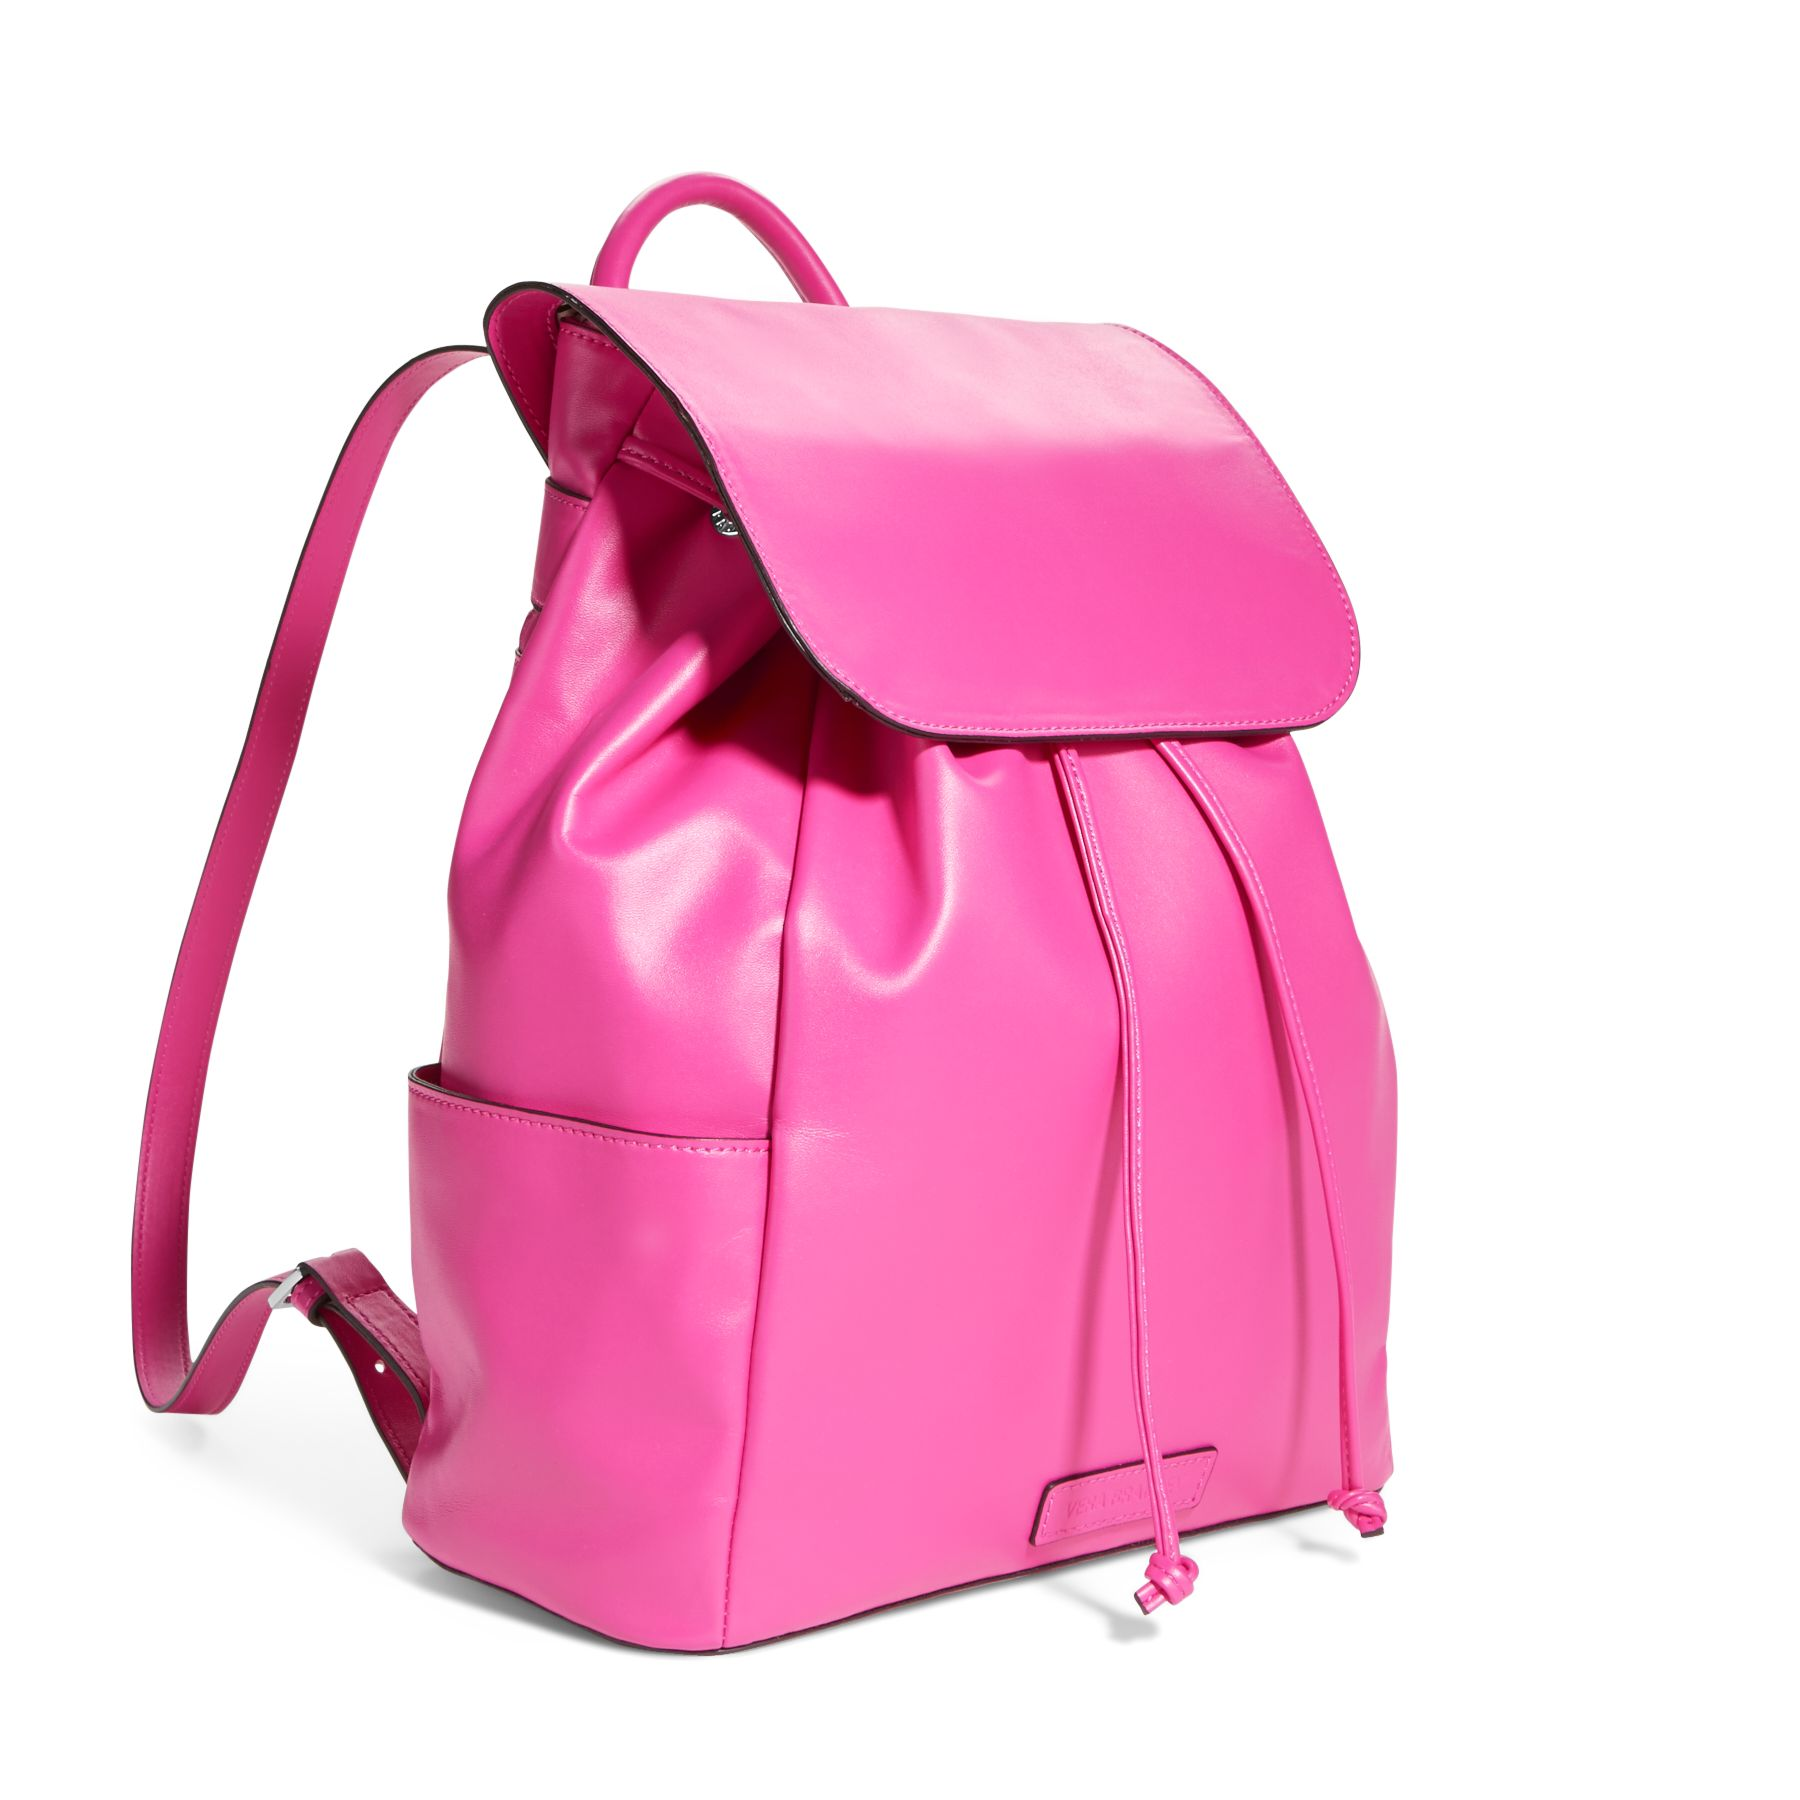 Vera Bradley Faux Leather Drawstring Backpack Purse | eBay